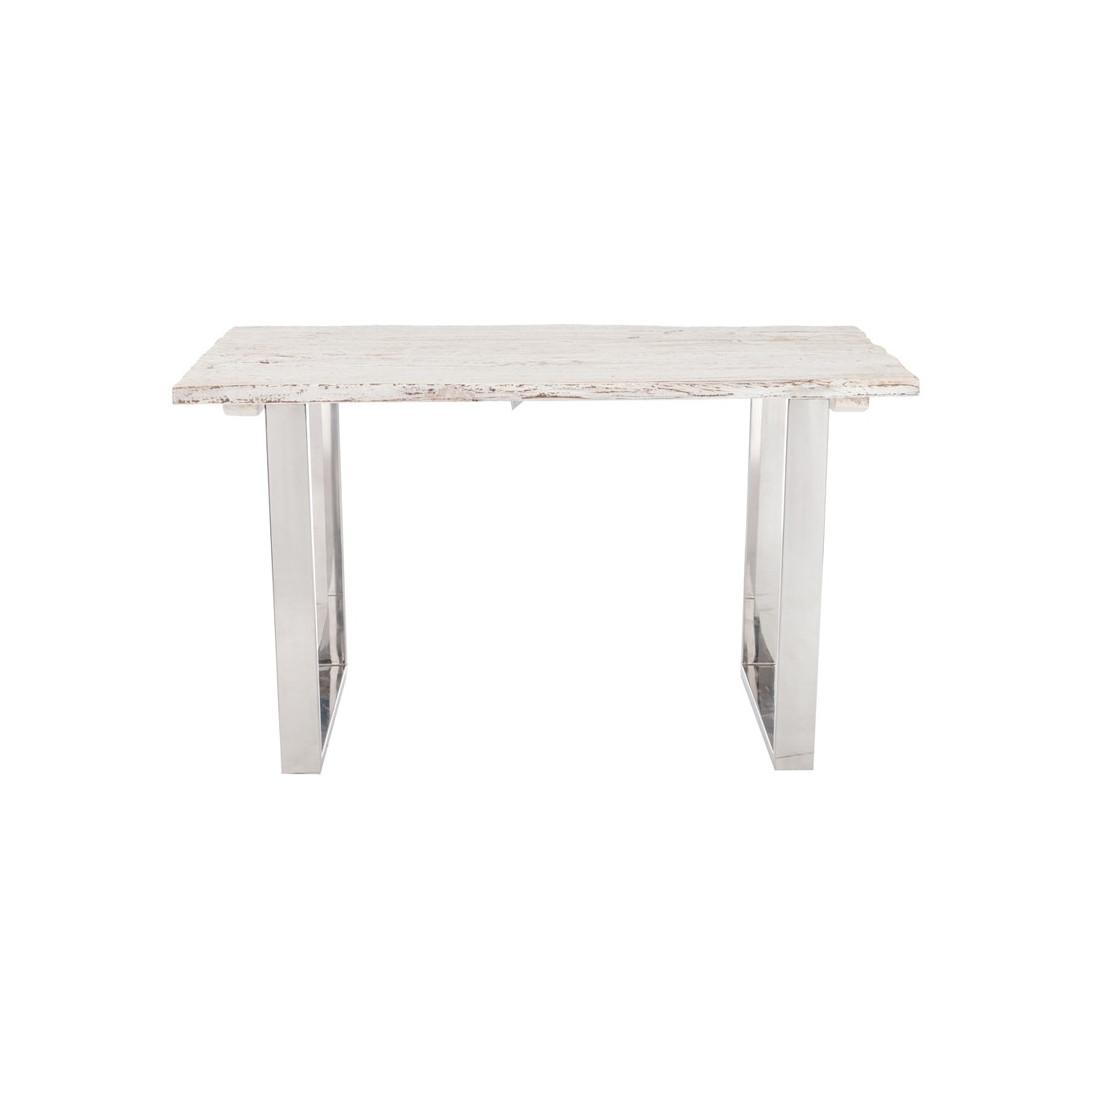 Bureau bois flott blanc et m tal chrom tanjane for Bureau bois blanc